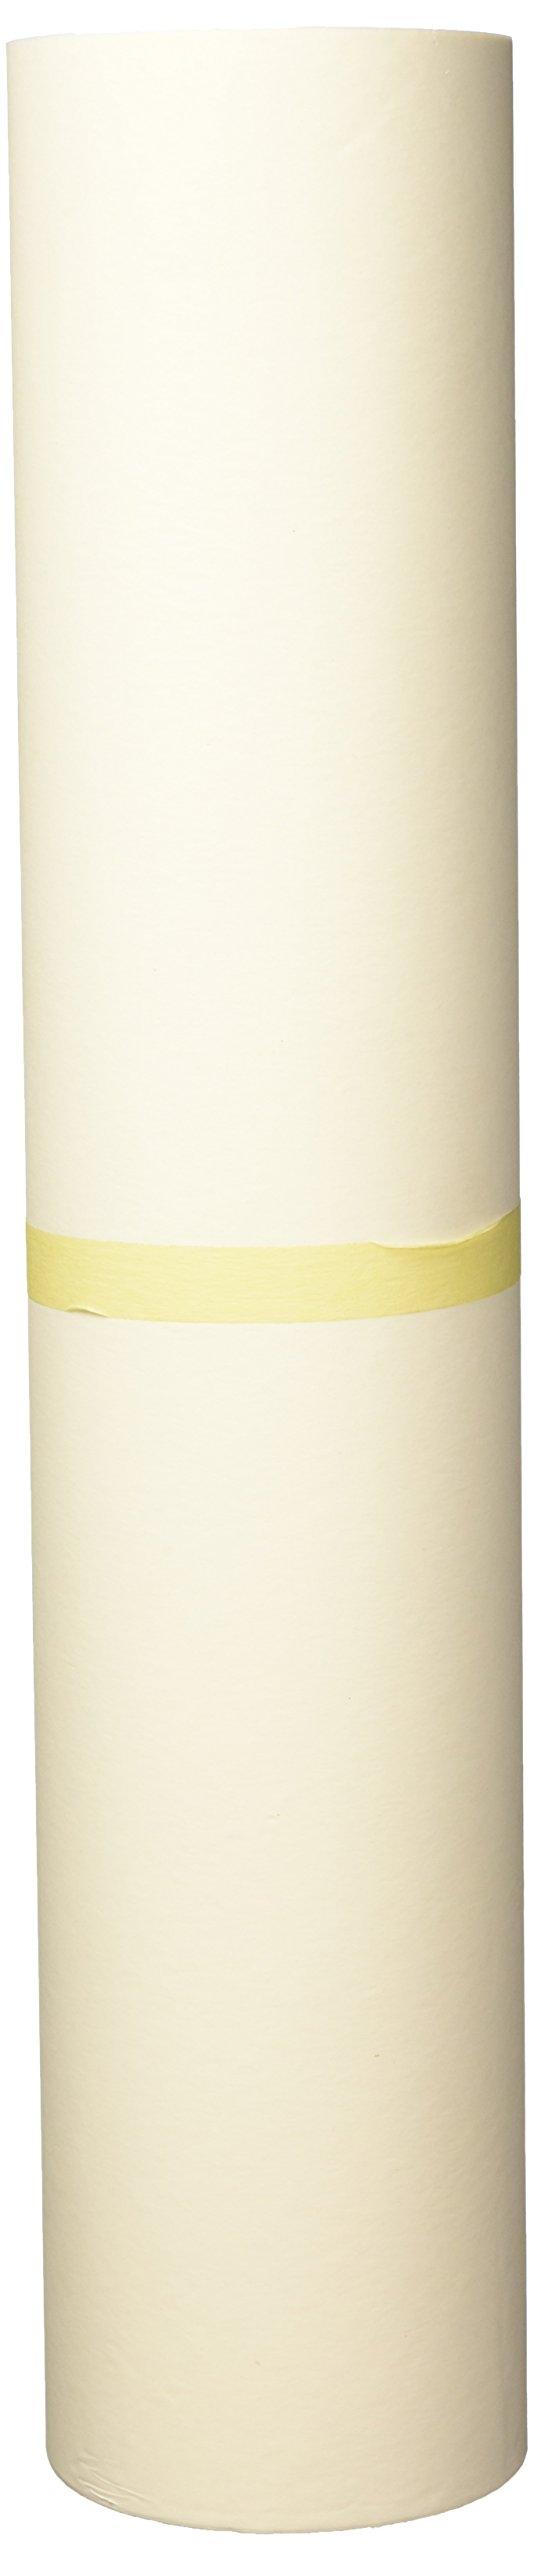 Matfer Bourgeat 320205 Exopat paper roll